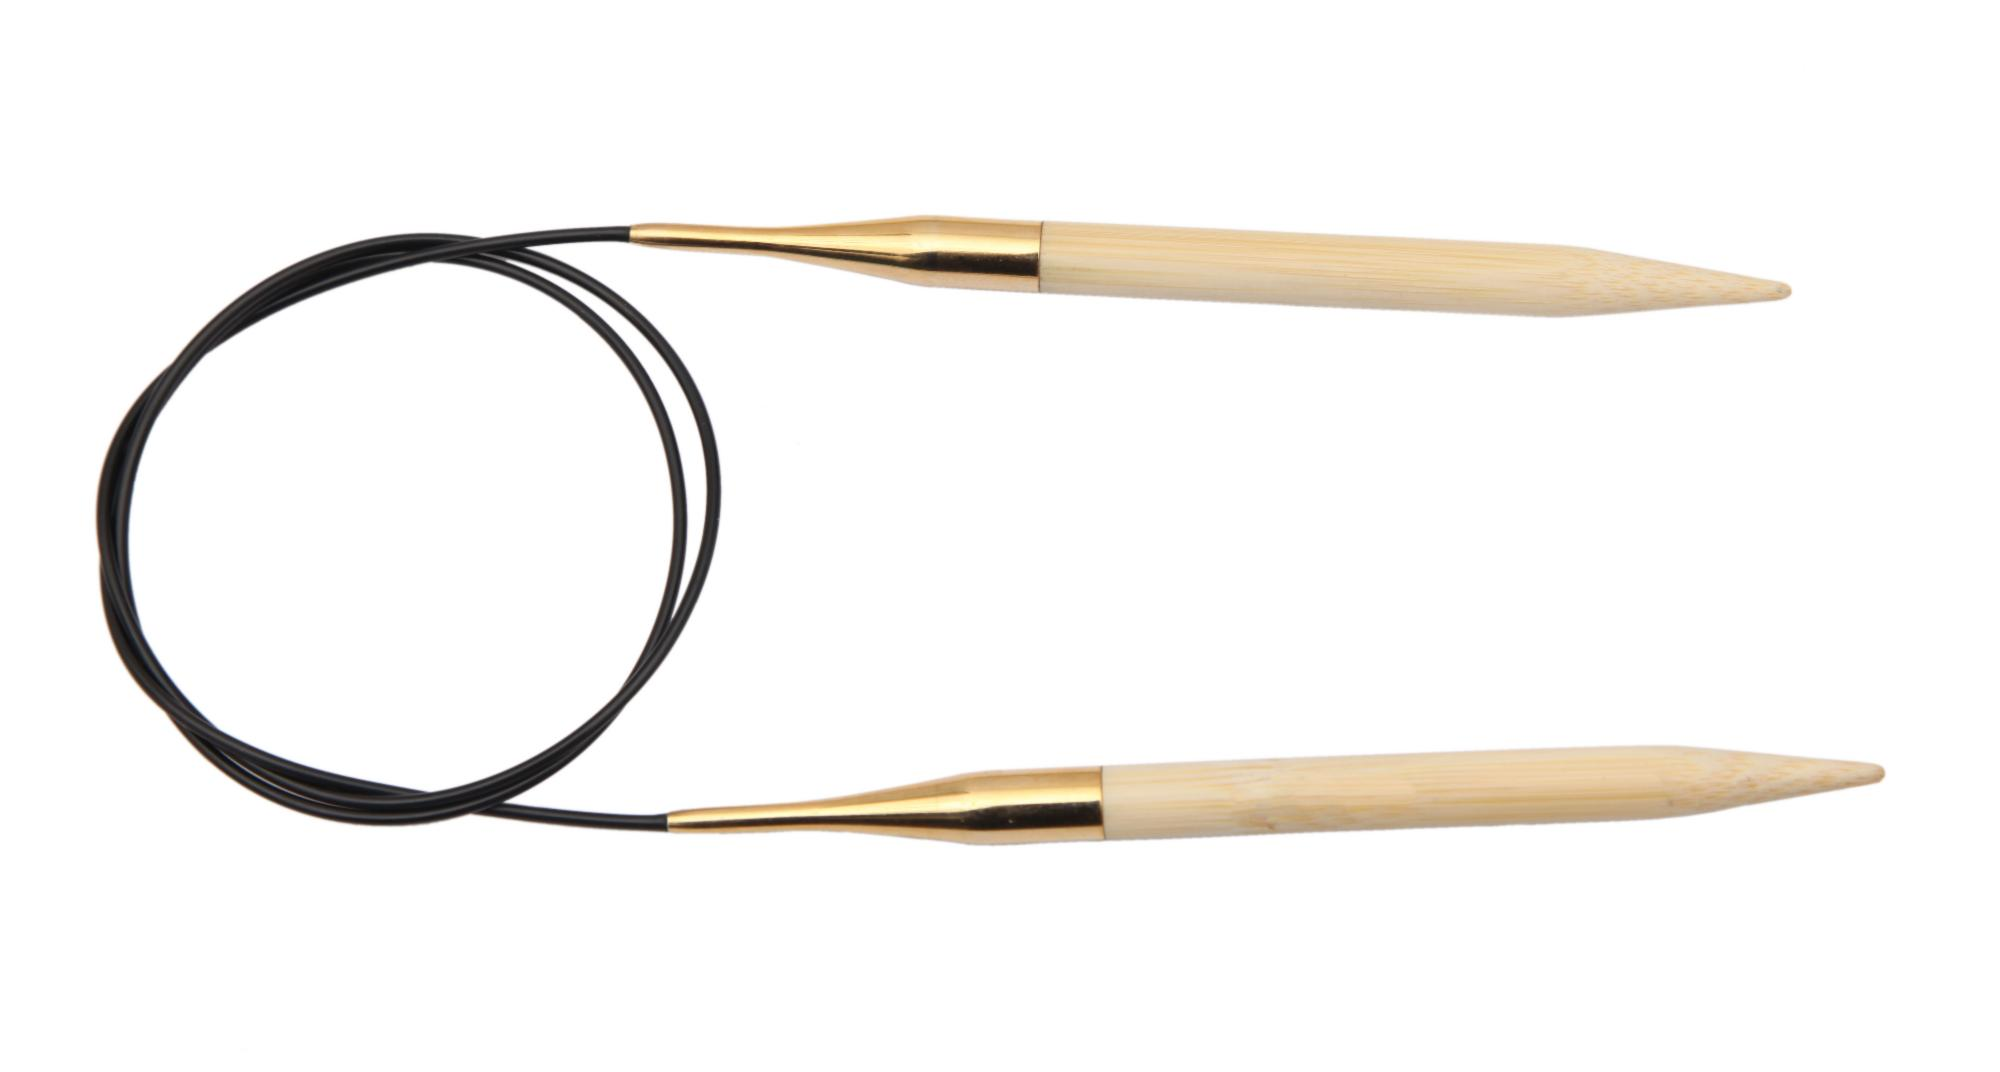 Спицы круговые 80 см Bamboo KnitPro, 22251, 6.00 мм